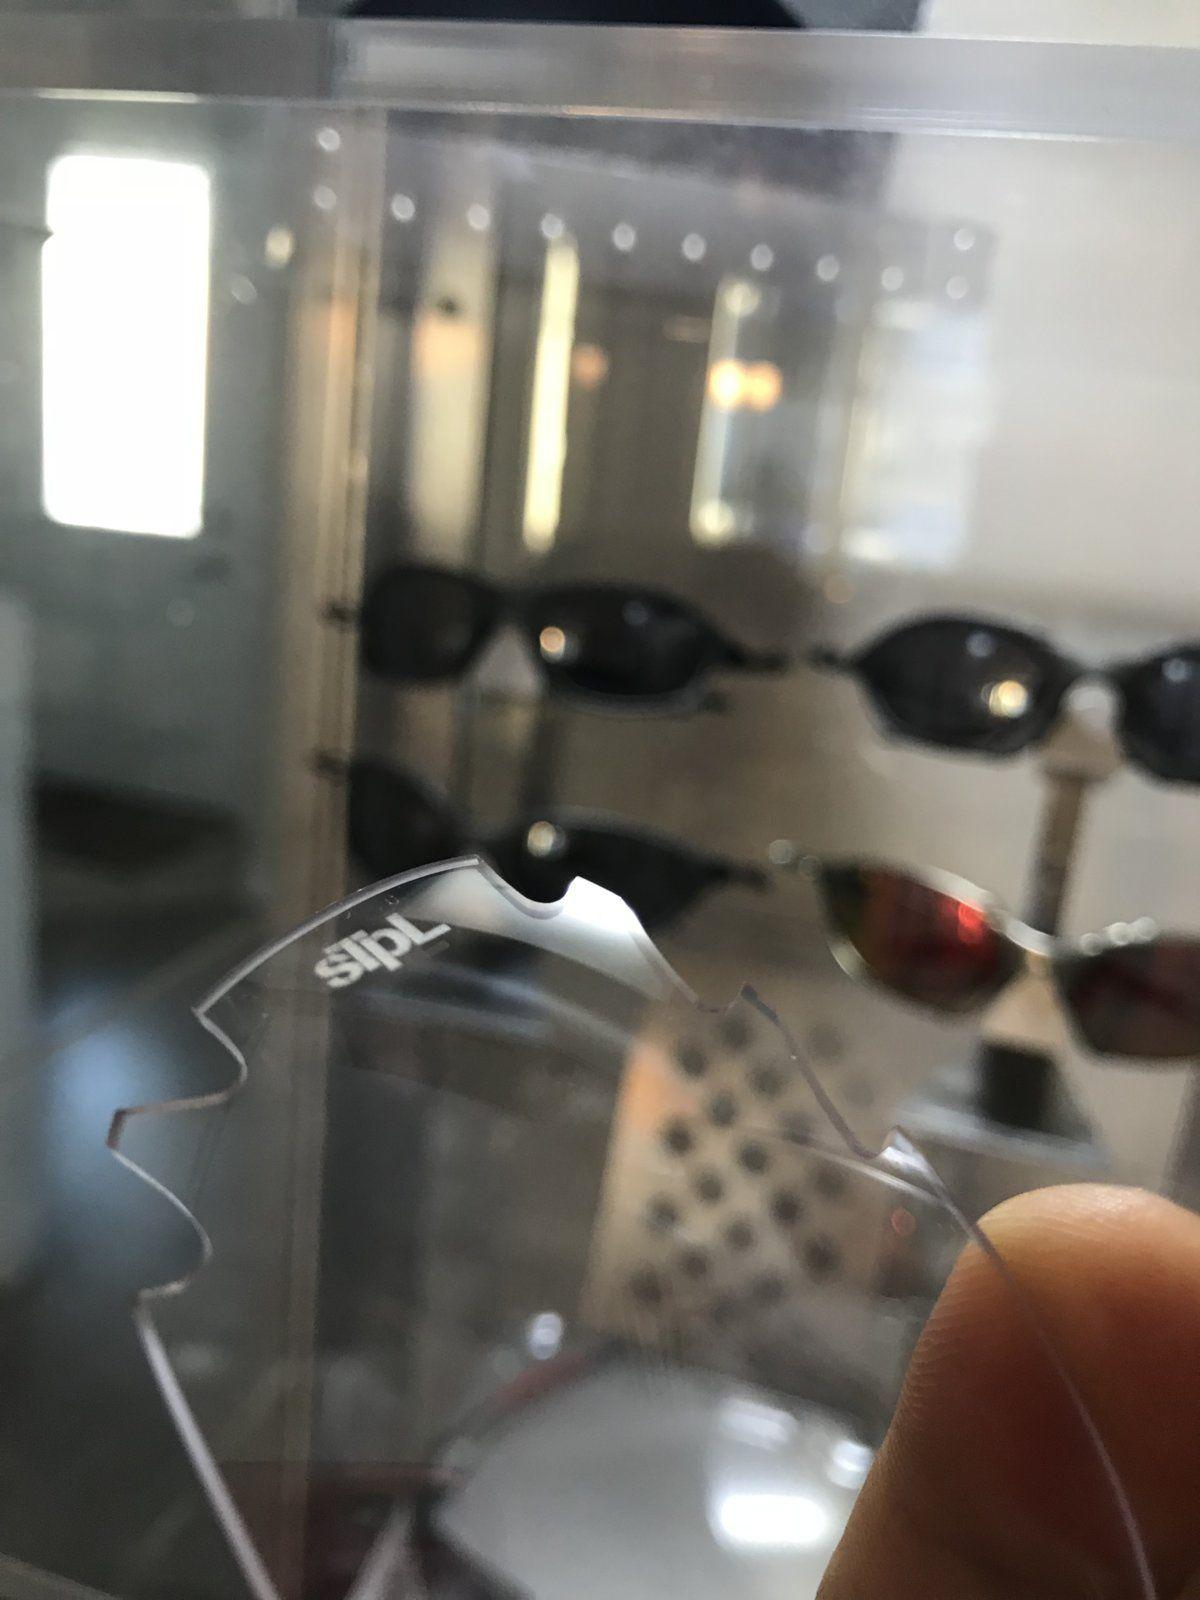 Clear Stpl and Clear RJ/Jawbone lense - 60B3FF6E-3EF9-4141-85B2-882E1D06ACDC.jpeg